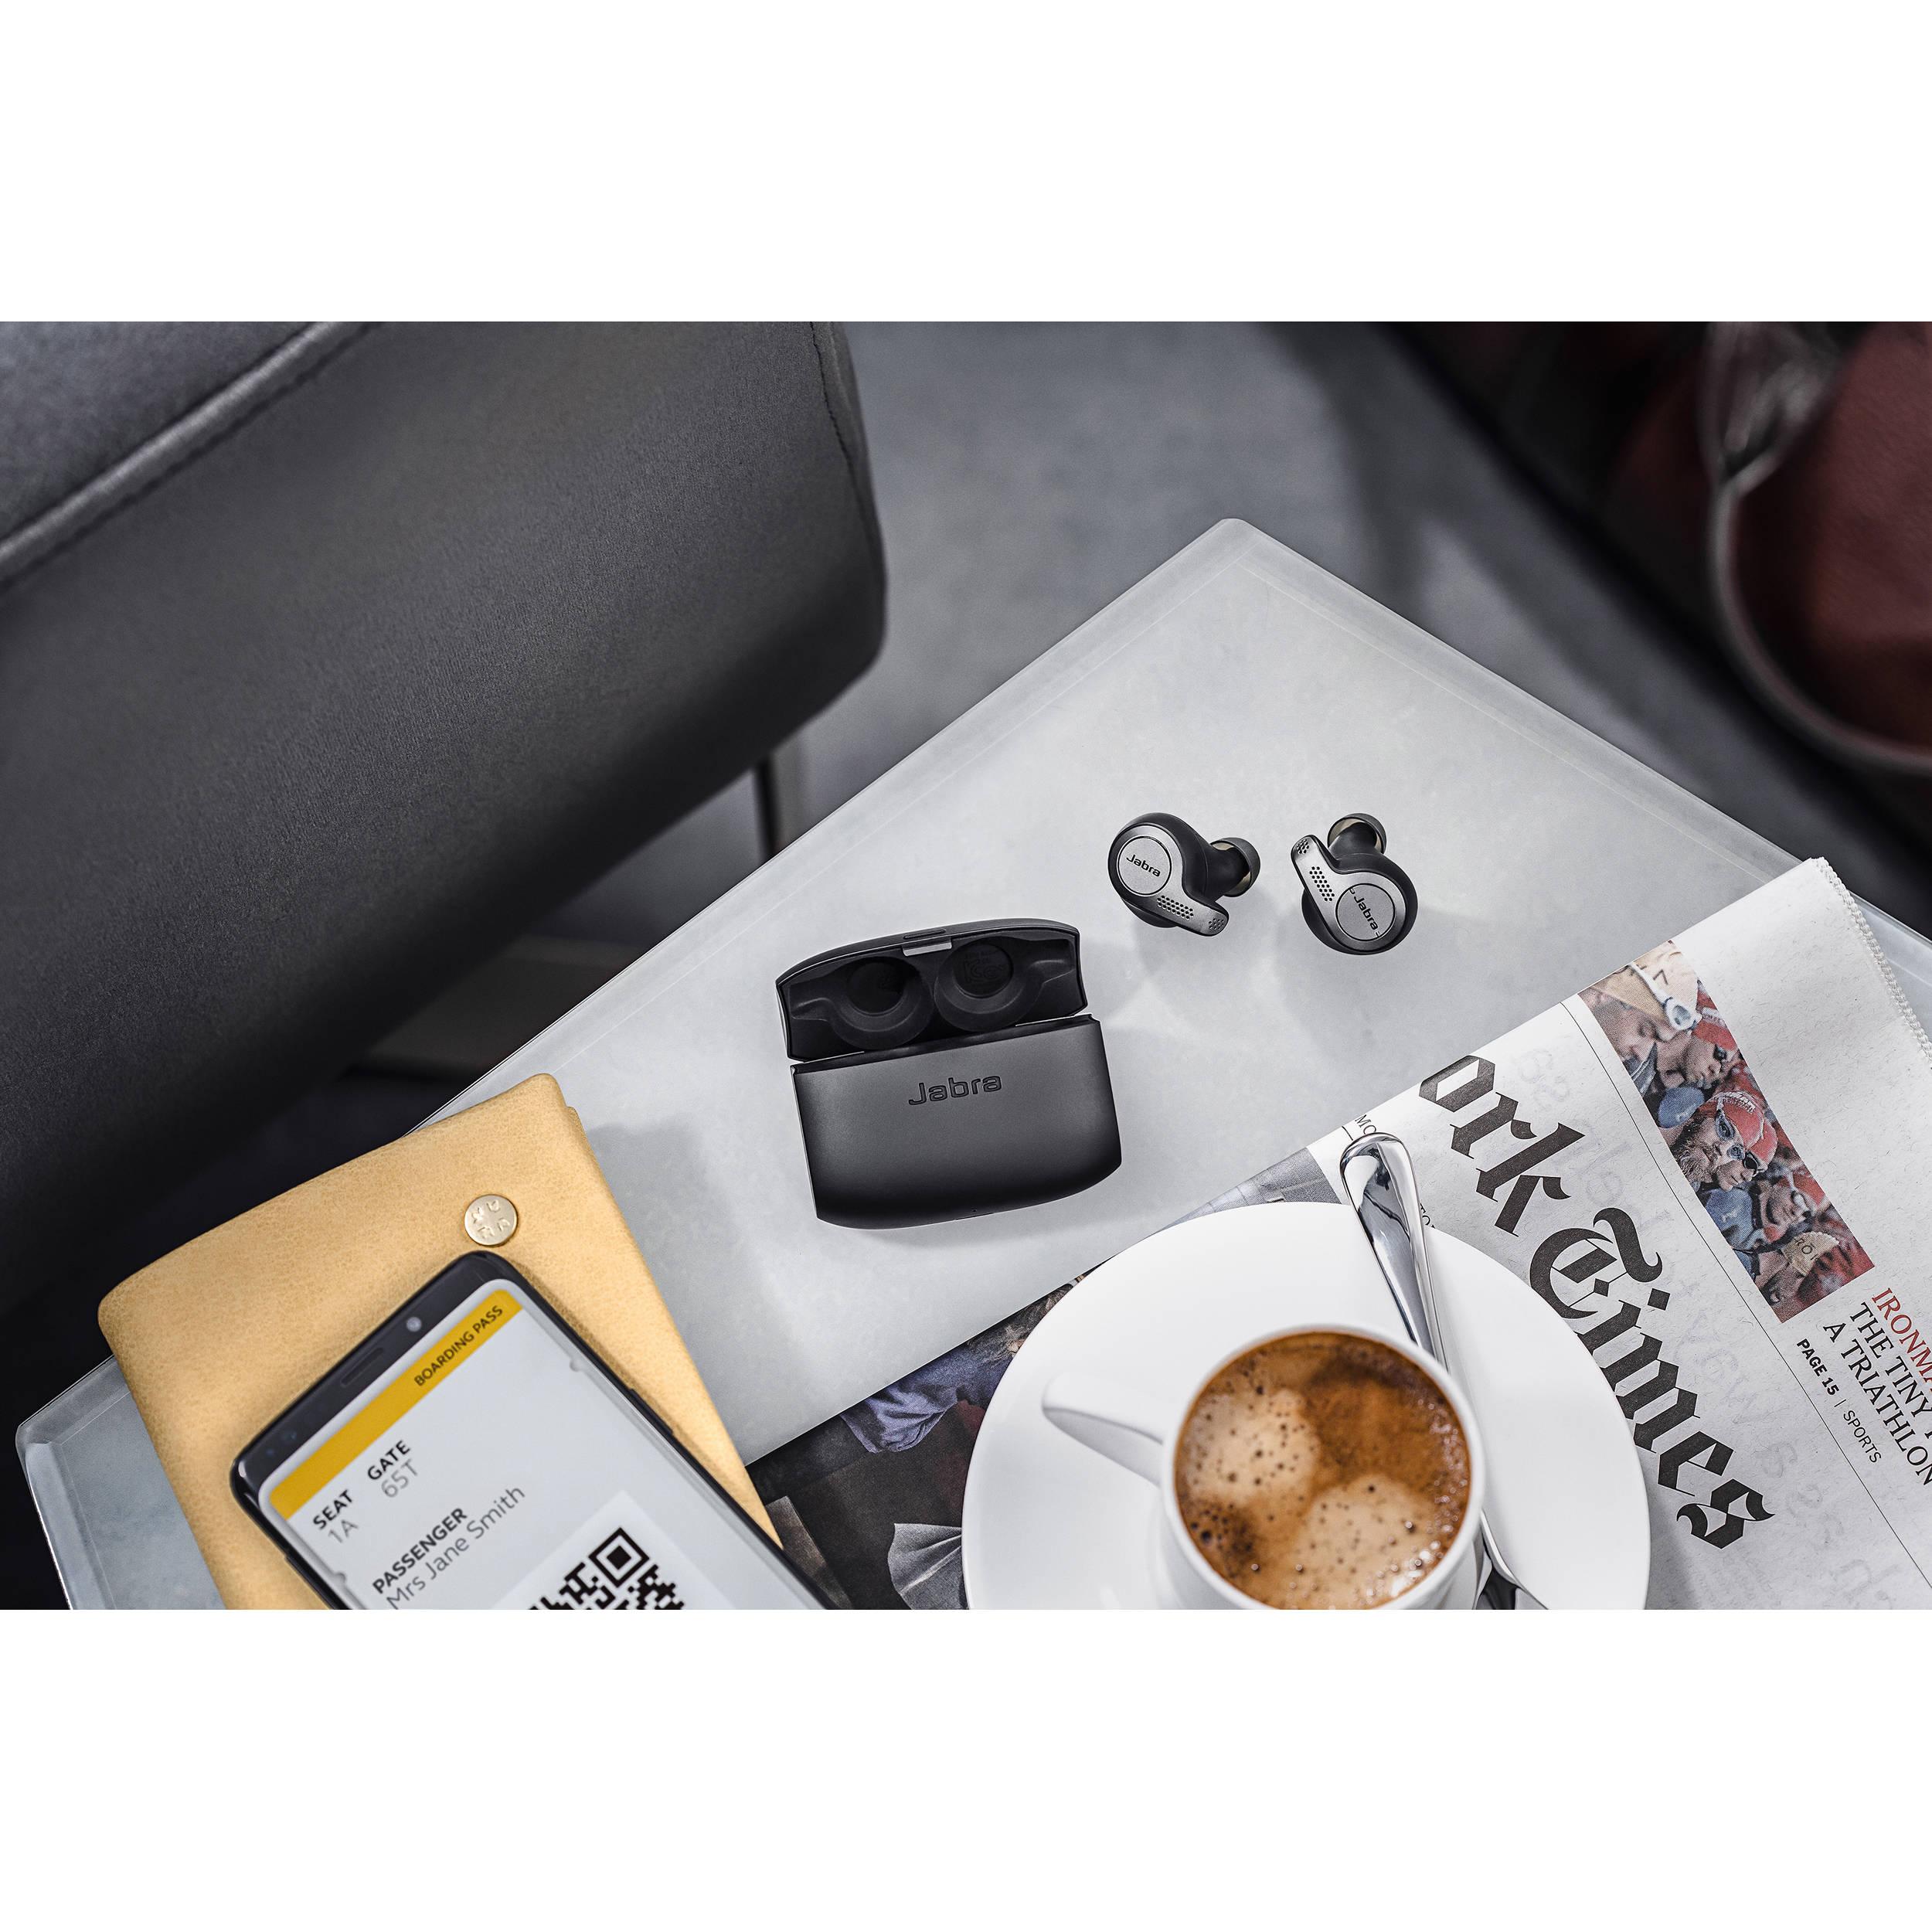 Jabra Evolve 65t Ms Wireless Earbuds Titanium Black